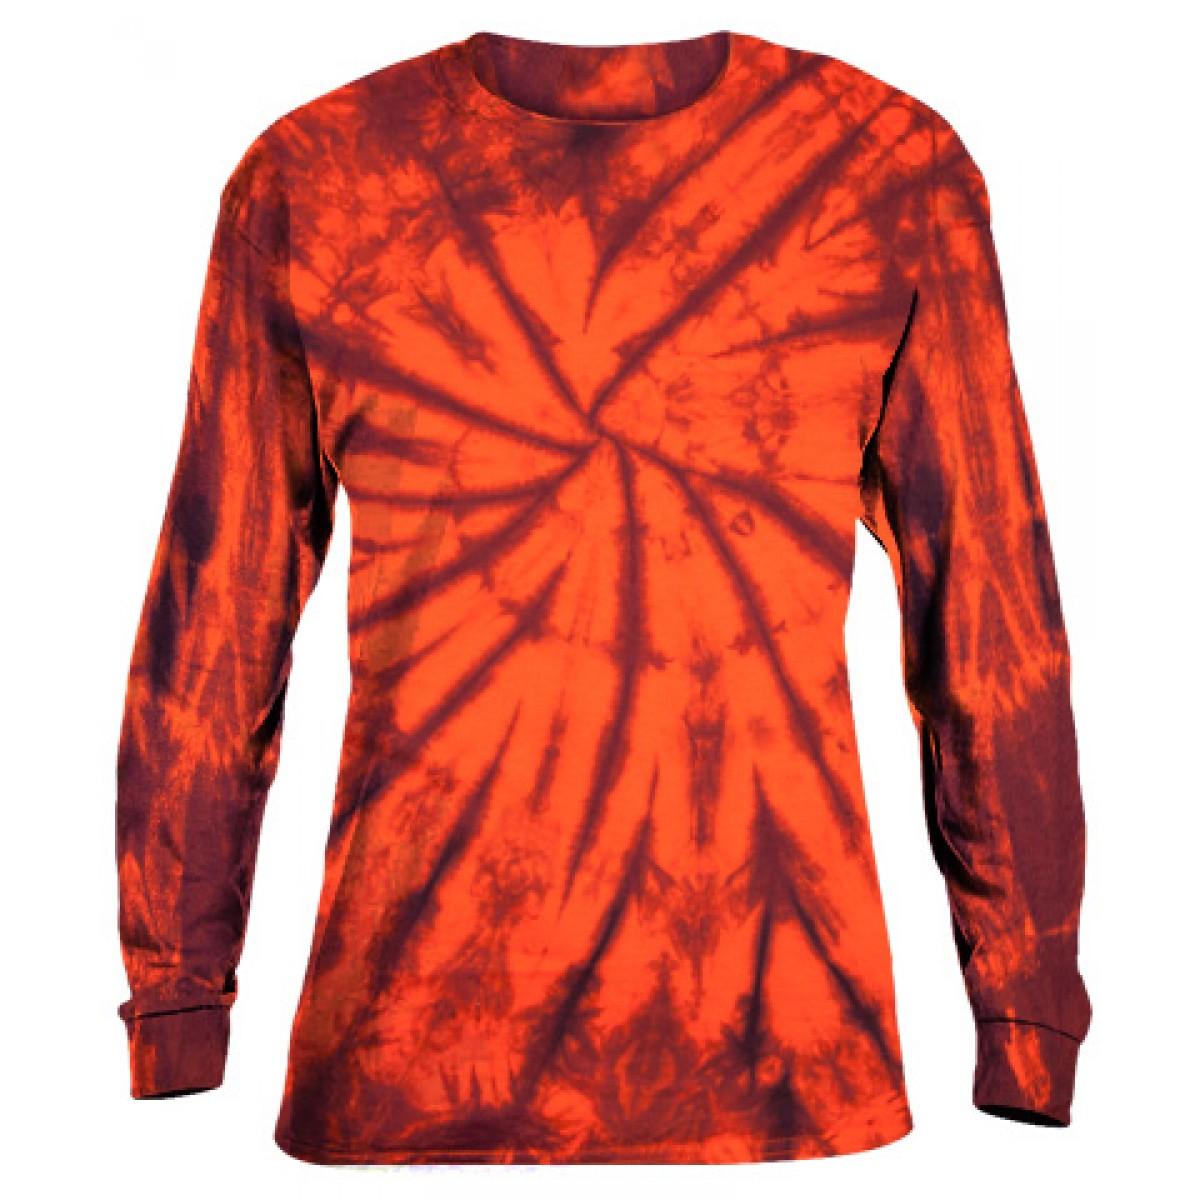 Tie-Dye Long Sleeve Shirt -Fall Orange -3XL